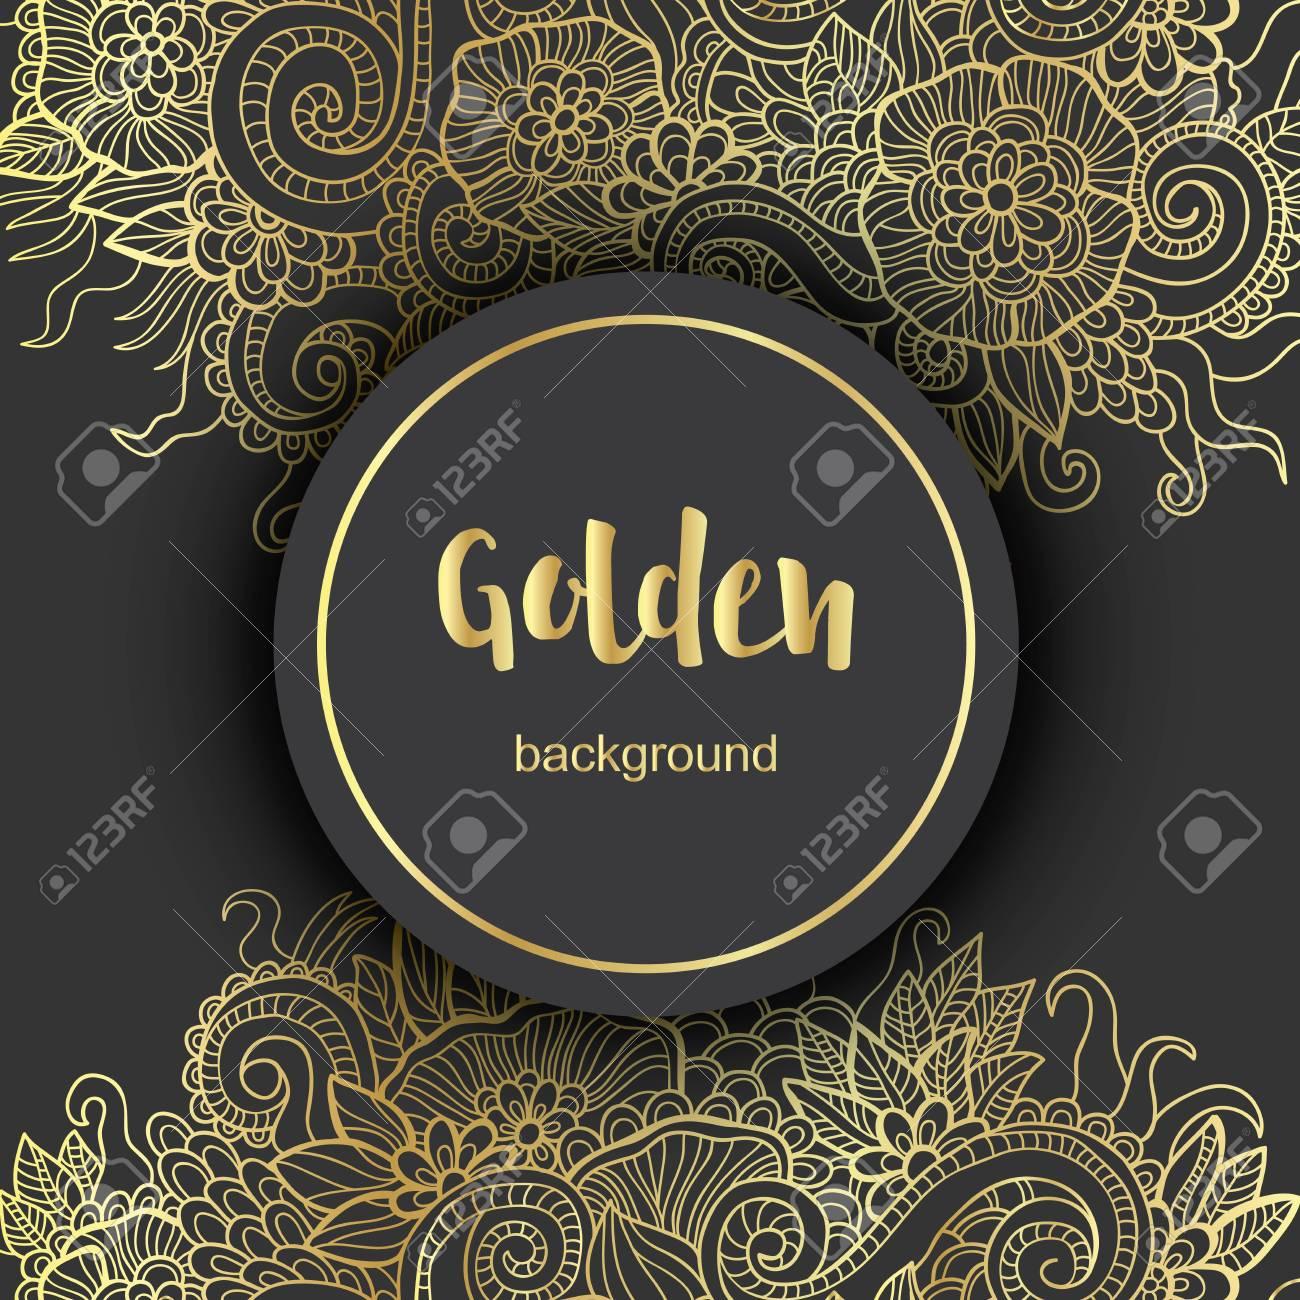 Luxury Golden Modern Background or Card. - 52953519